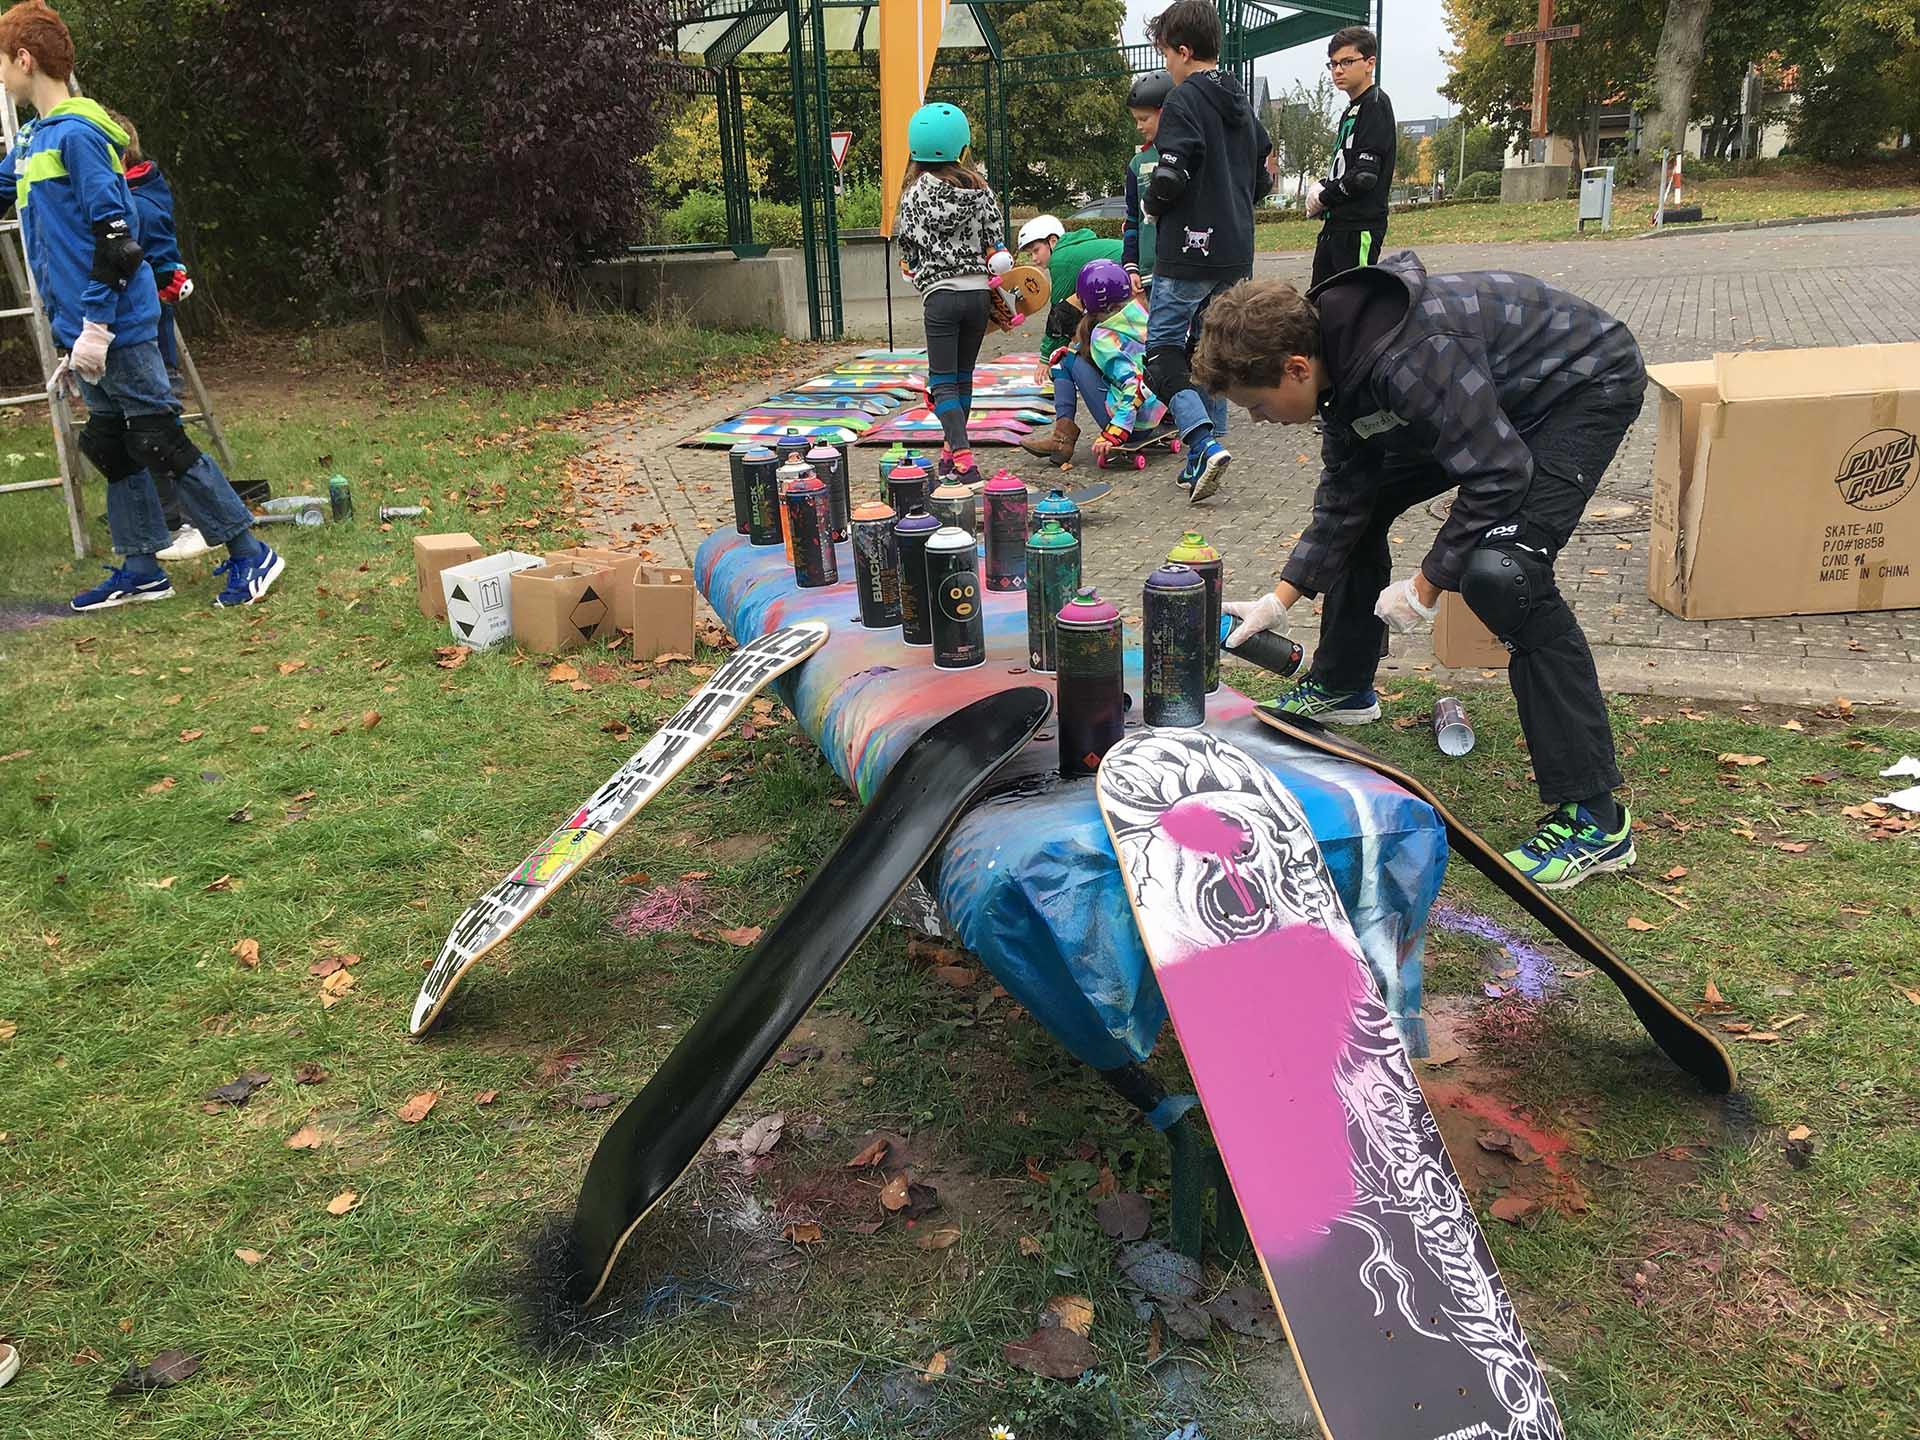 Skate-Aid, Workshop, Graffiti, Skateboarding, Lernen, Sprayen, Urban, Skaten, Bennet Grüttner, Studio Auckz.